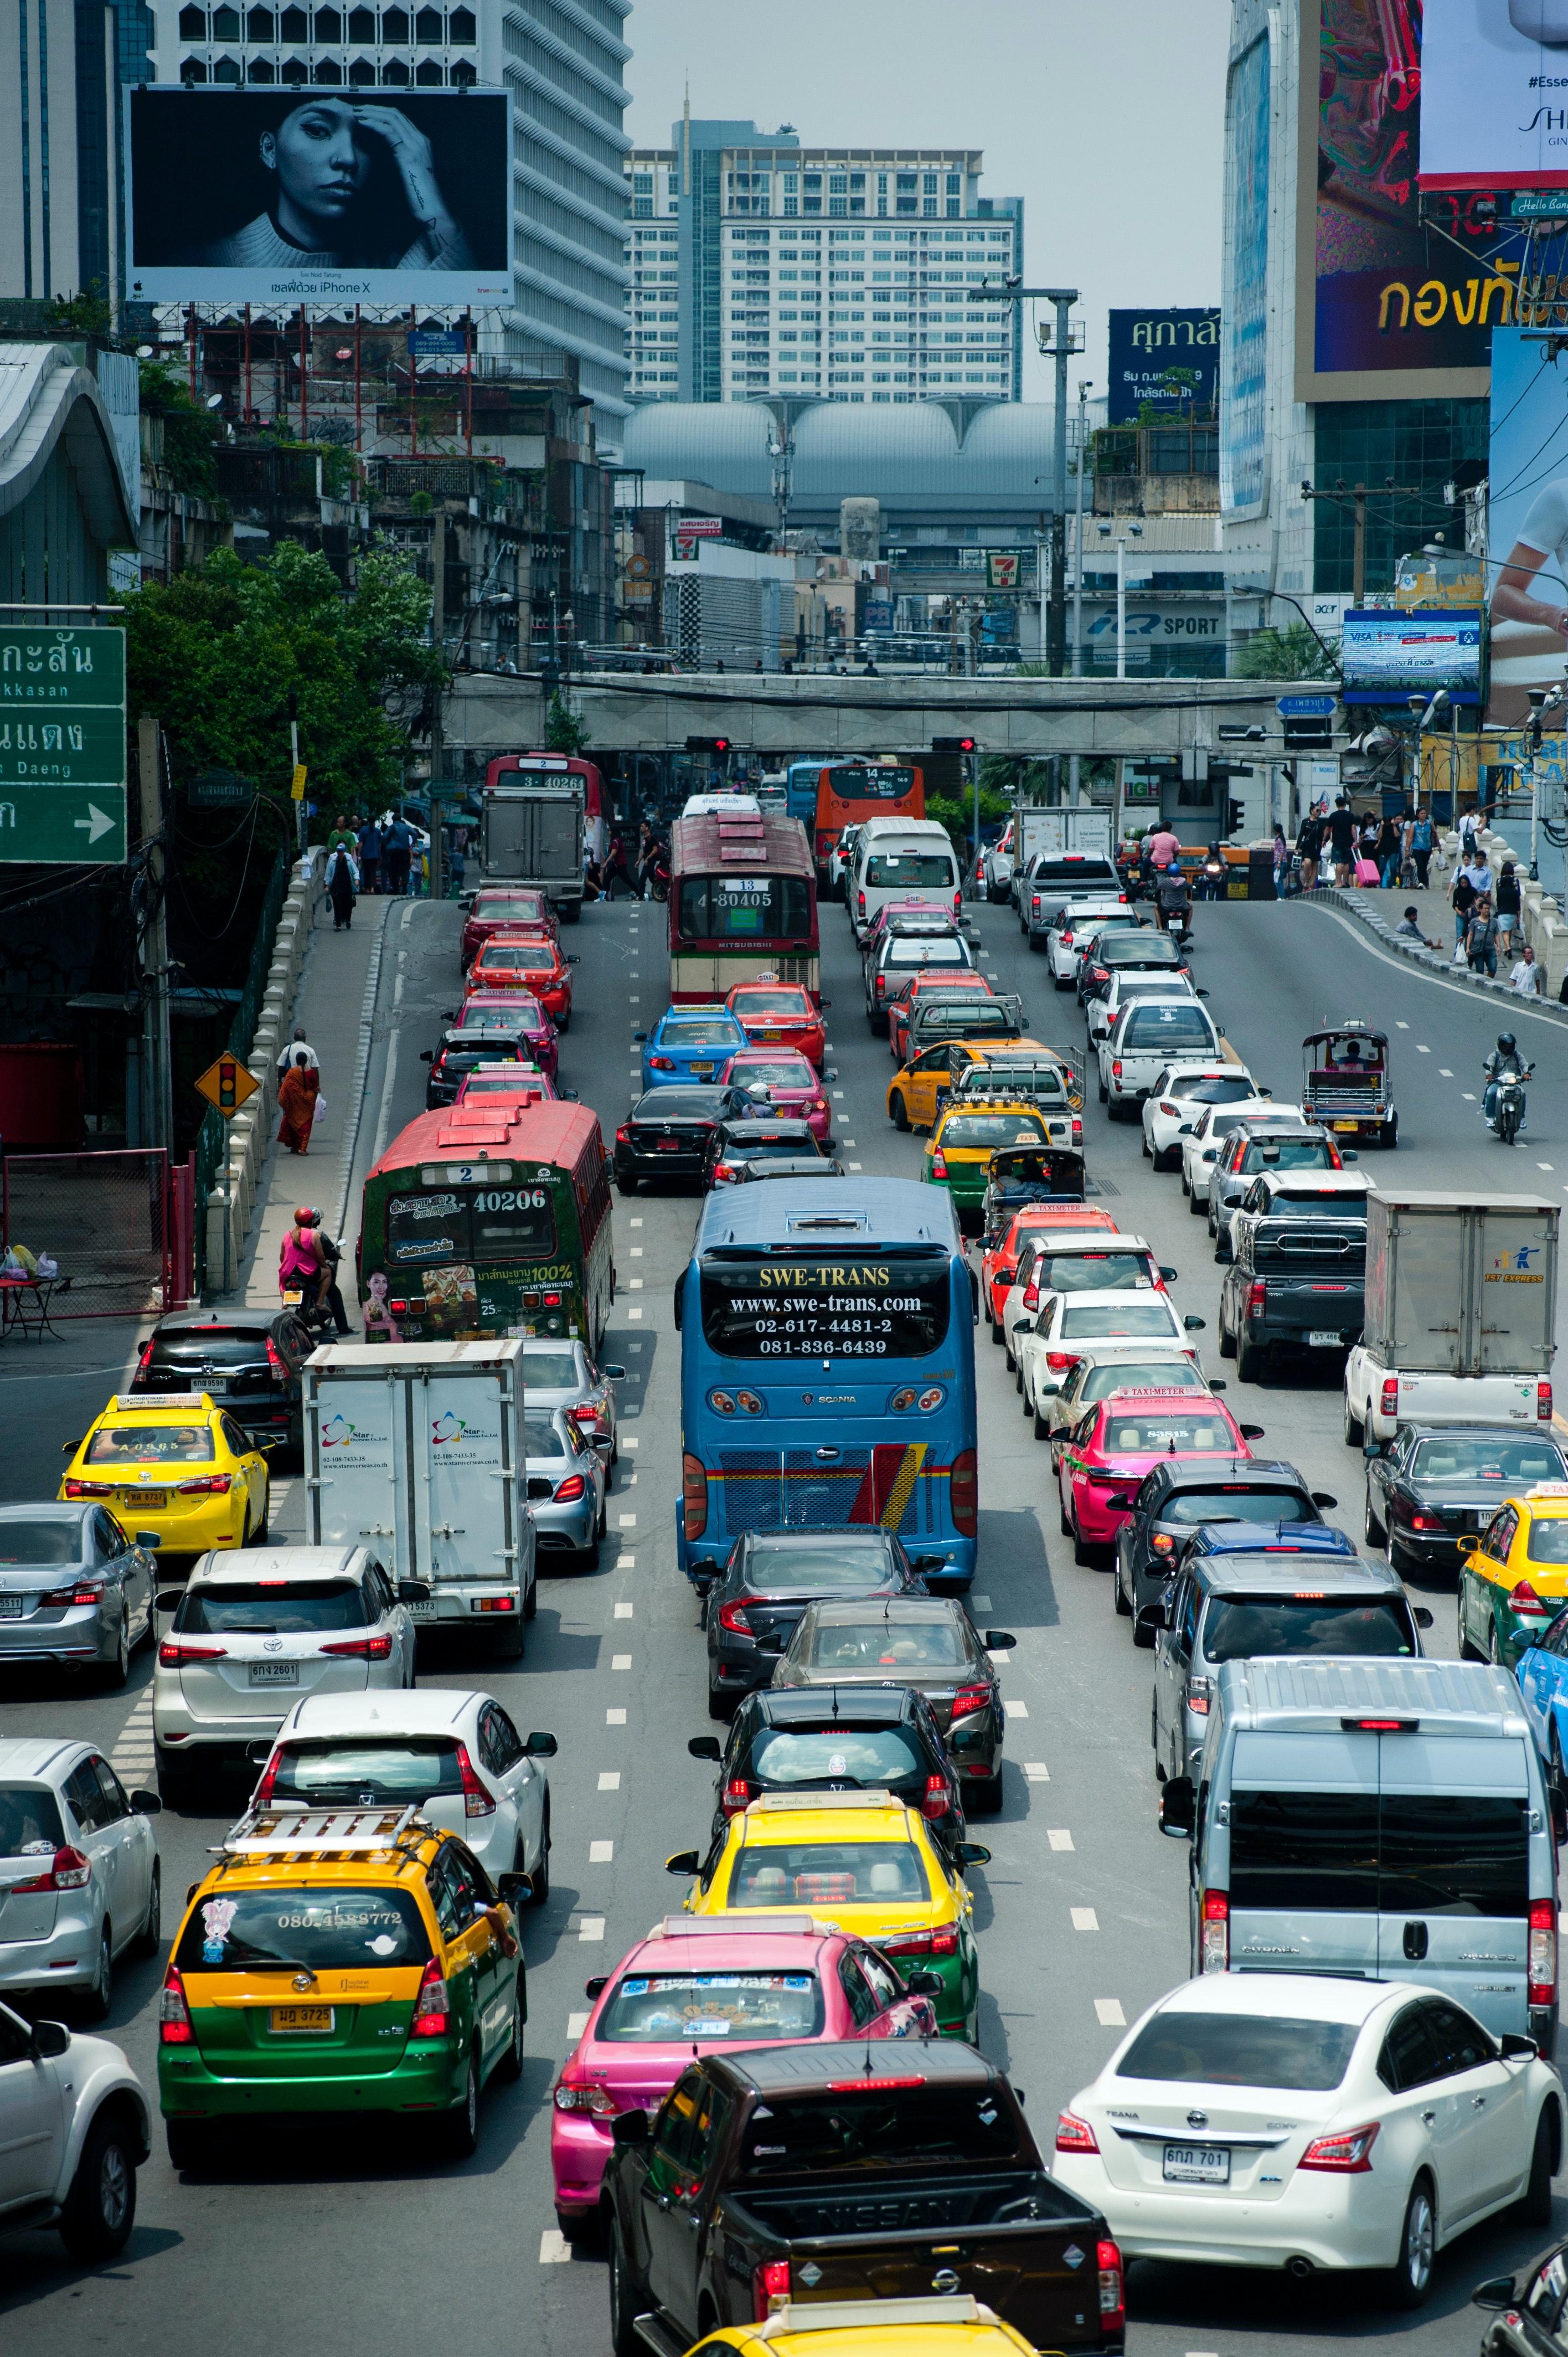 500+ Interesting Traffic Jam Photos · Pexels · Free Stock